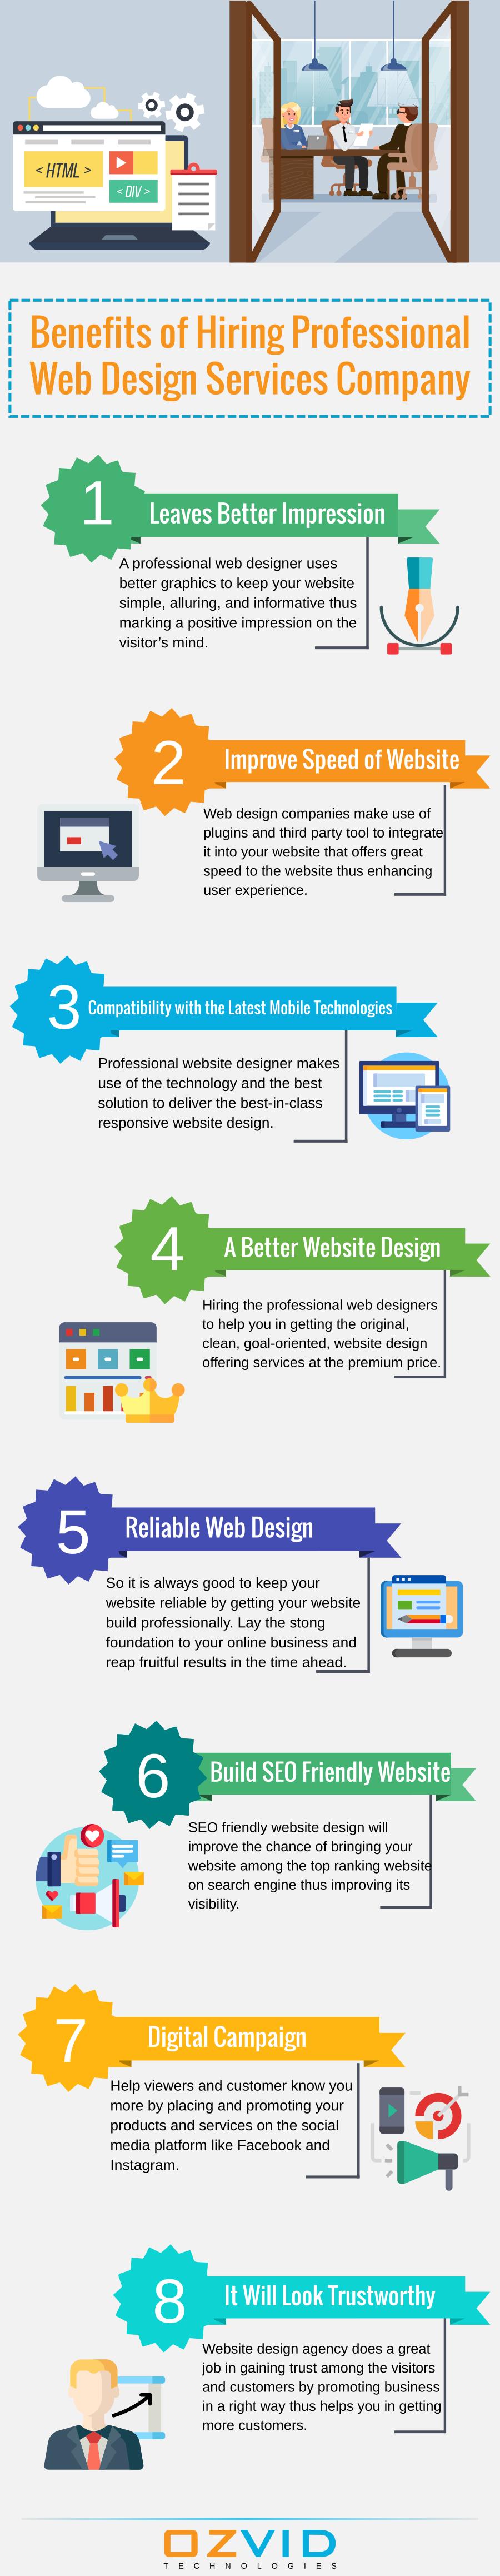 Benefits Of Hiring Professional Web Design Services Company Web Design Services Service Design Professional Web Design